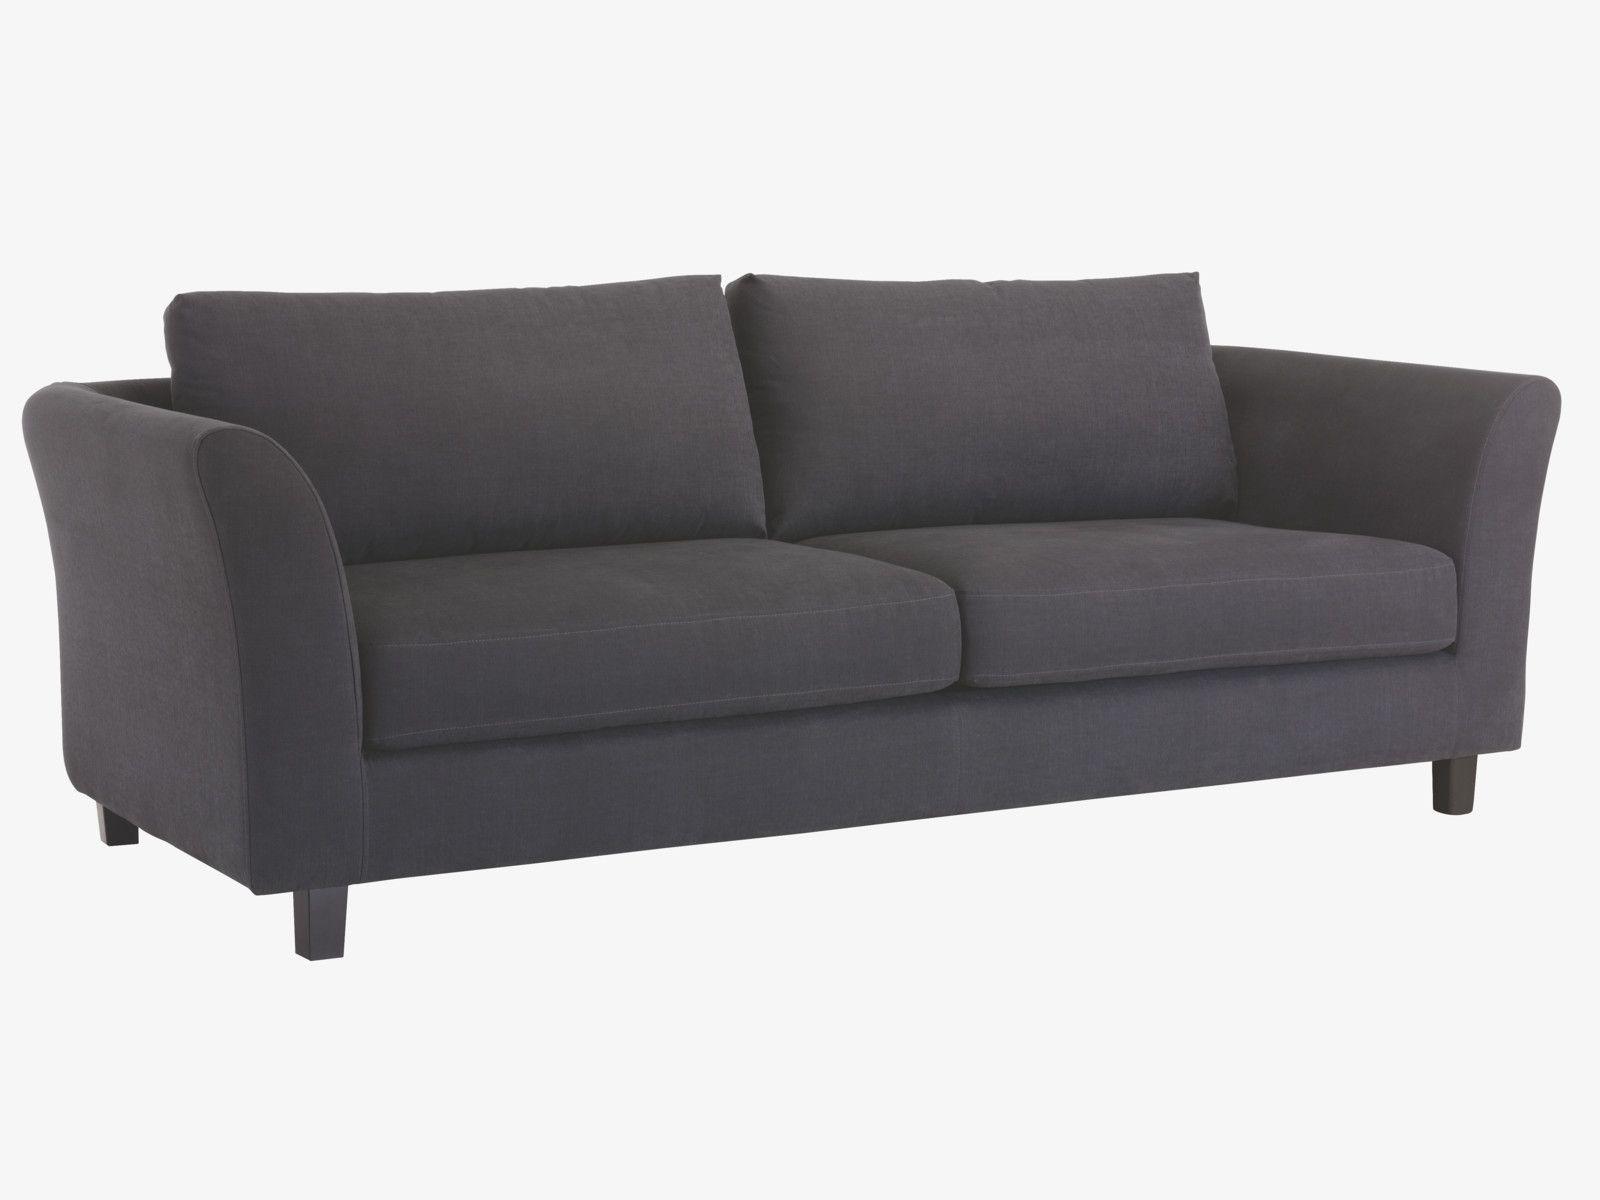 ALCOTT BLUES Cotton Blend Fabric 3 Seater Sofa Bed   HabitatUK A Habitat  Exclusive Design,